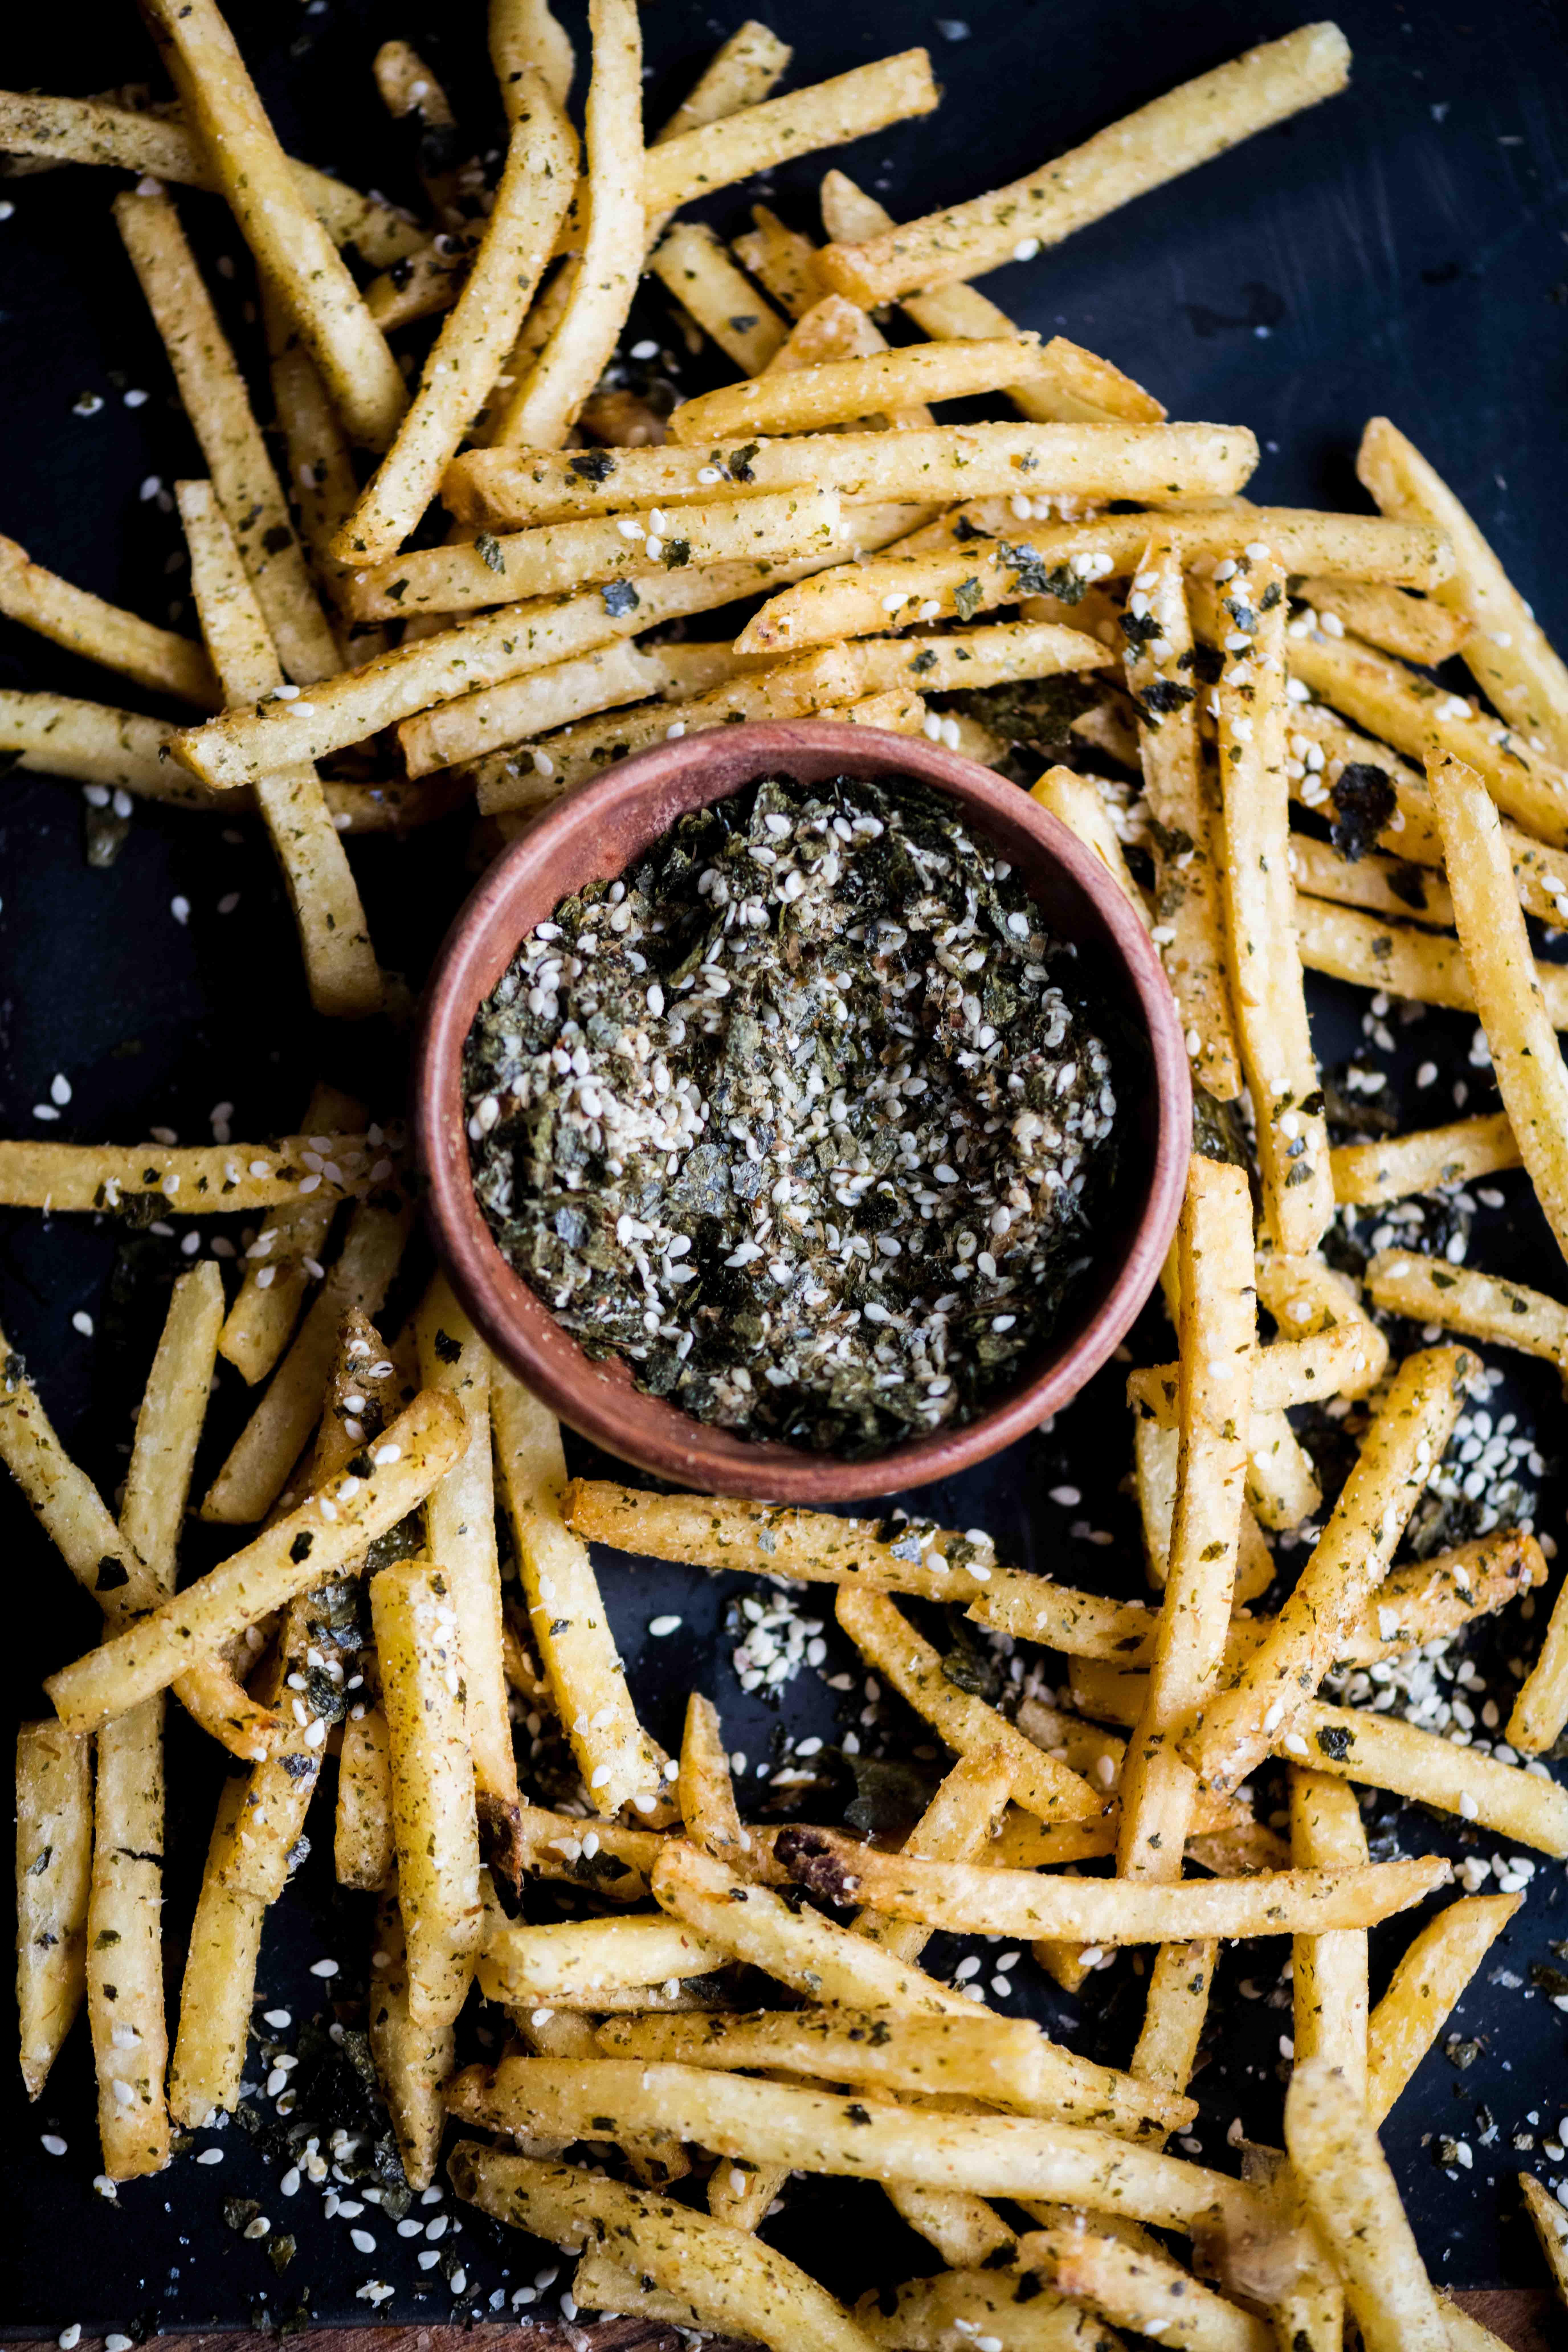 Fries with Homemade Furikake Seasoning and Wasabi Mayo